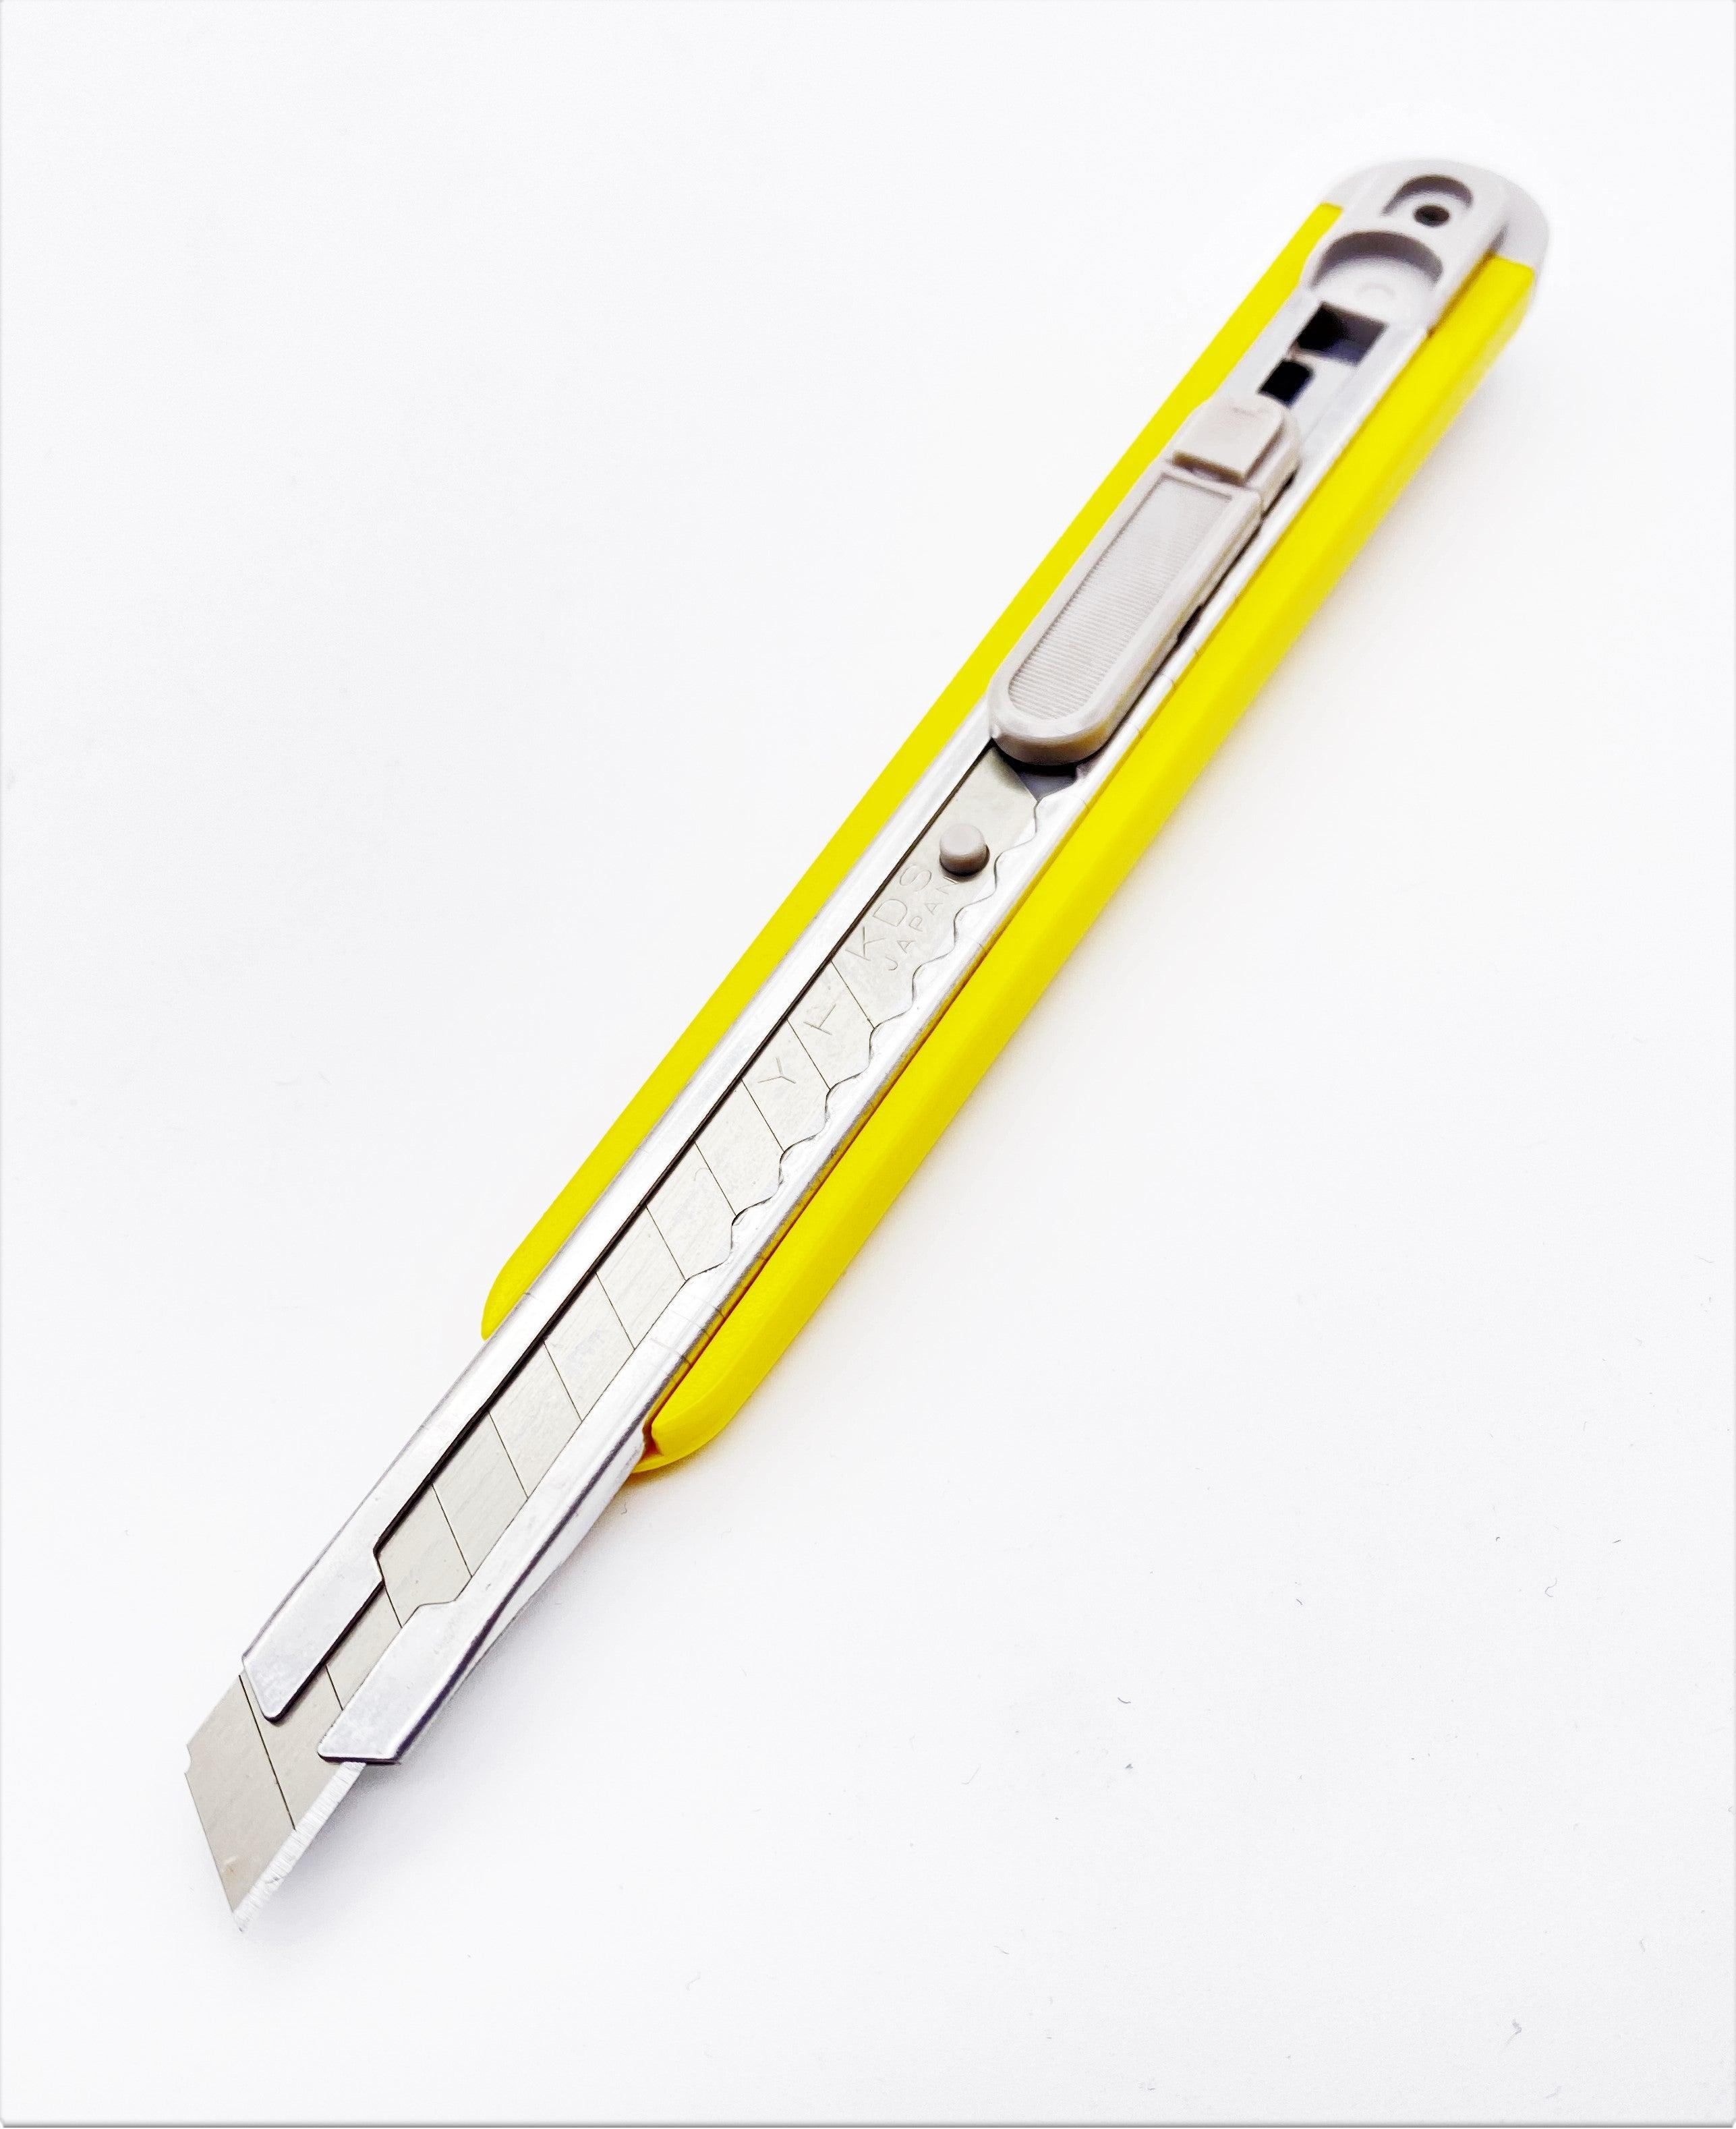 KDS Pocketslim Cutter, 9mm